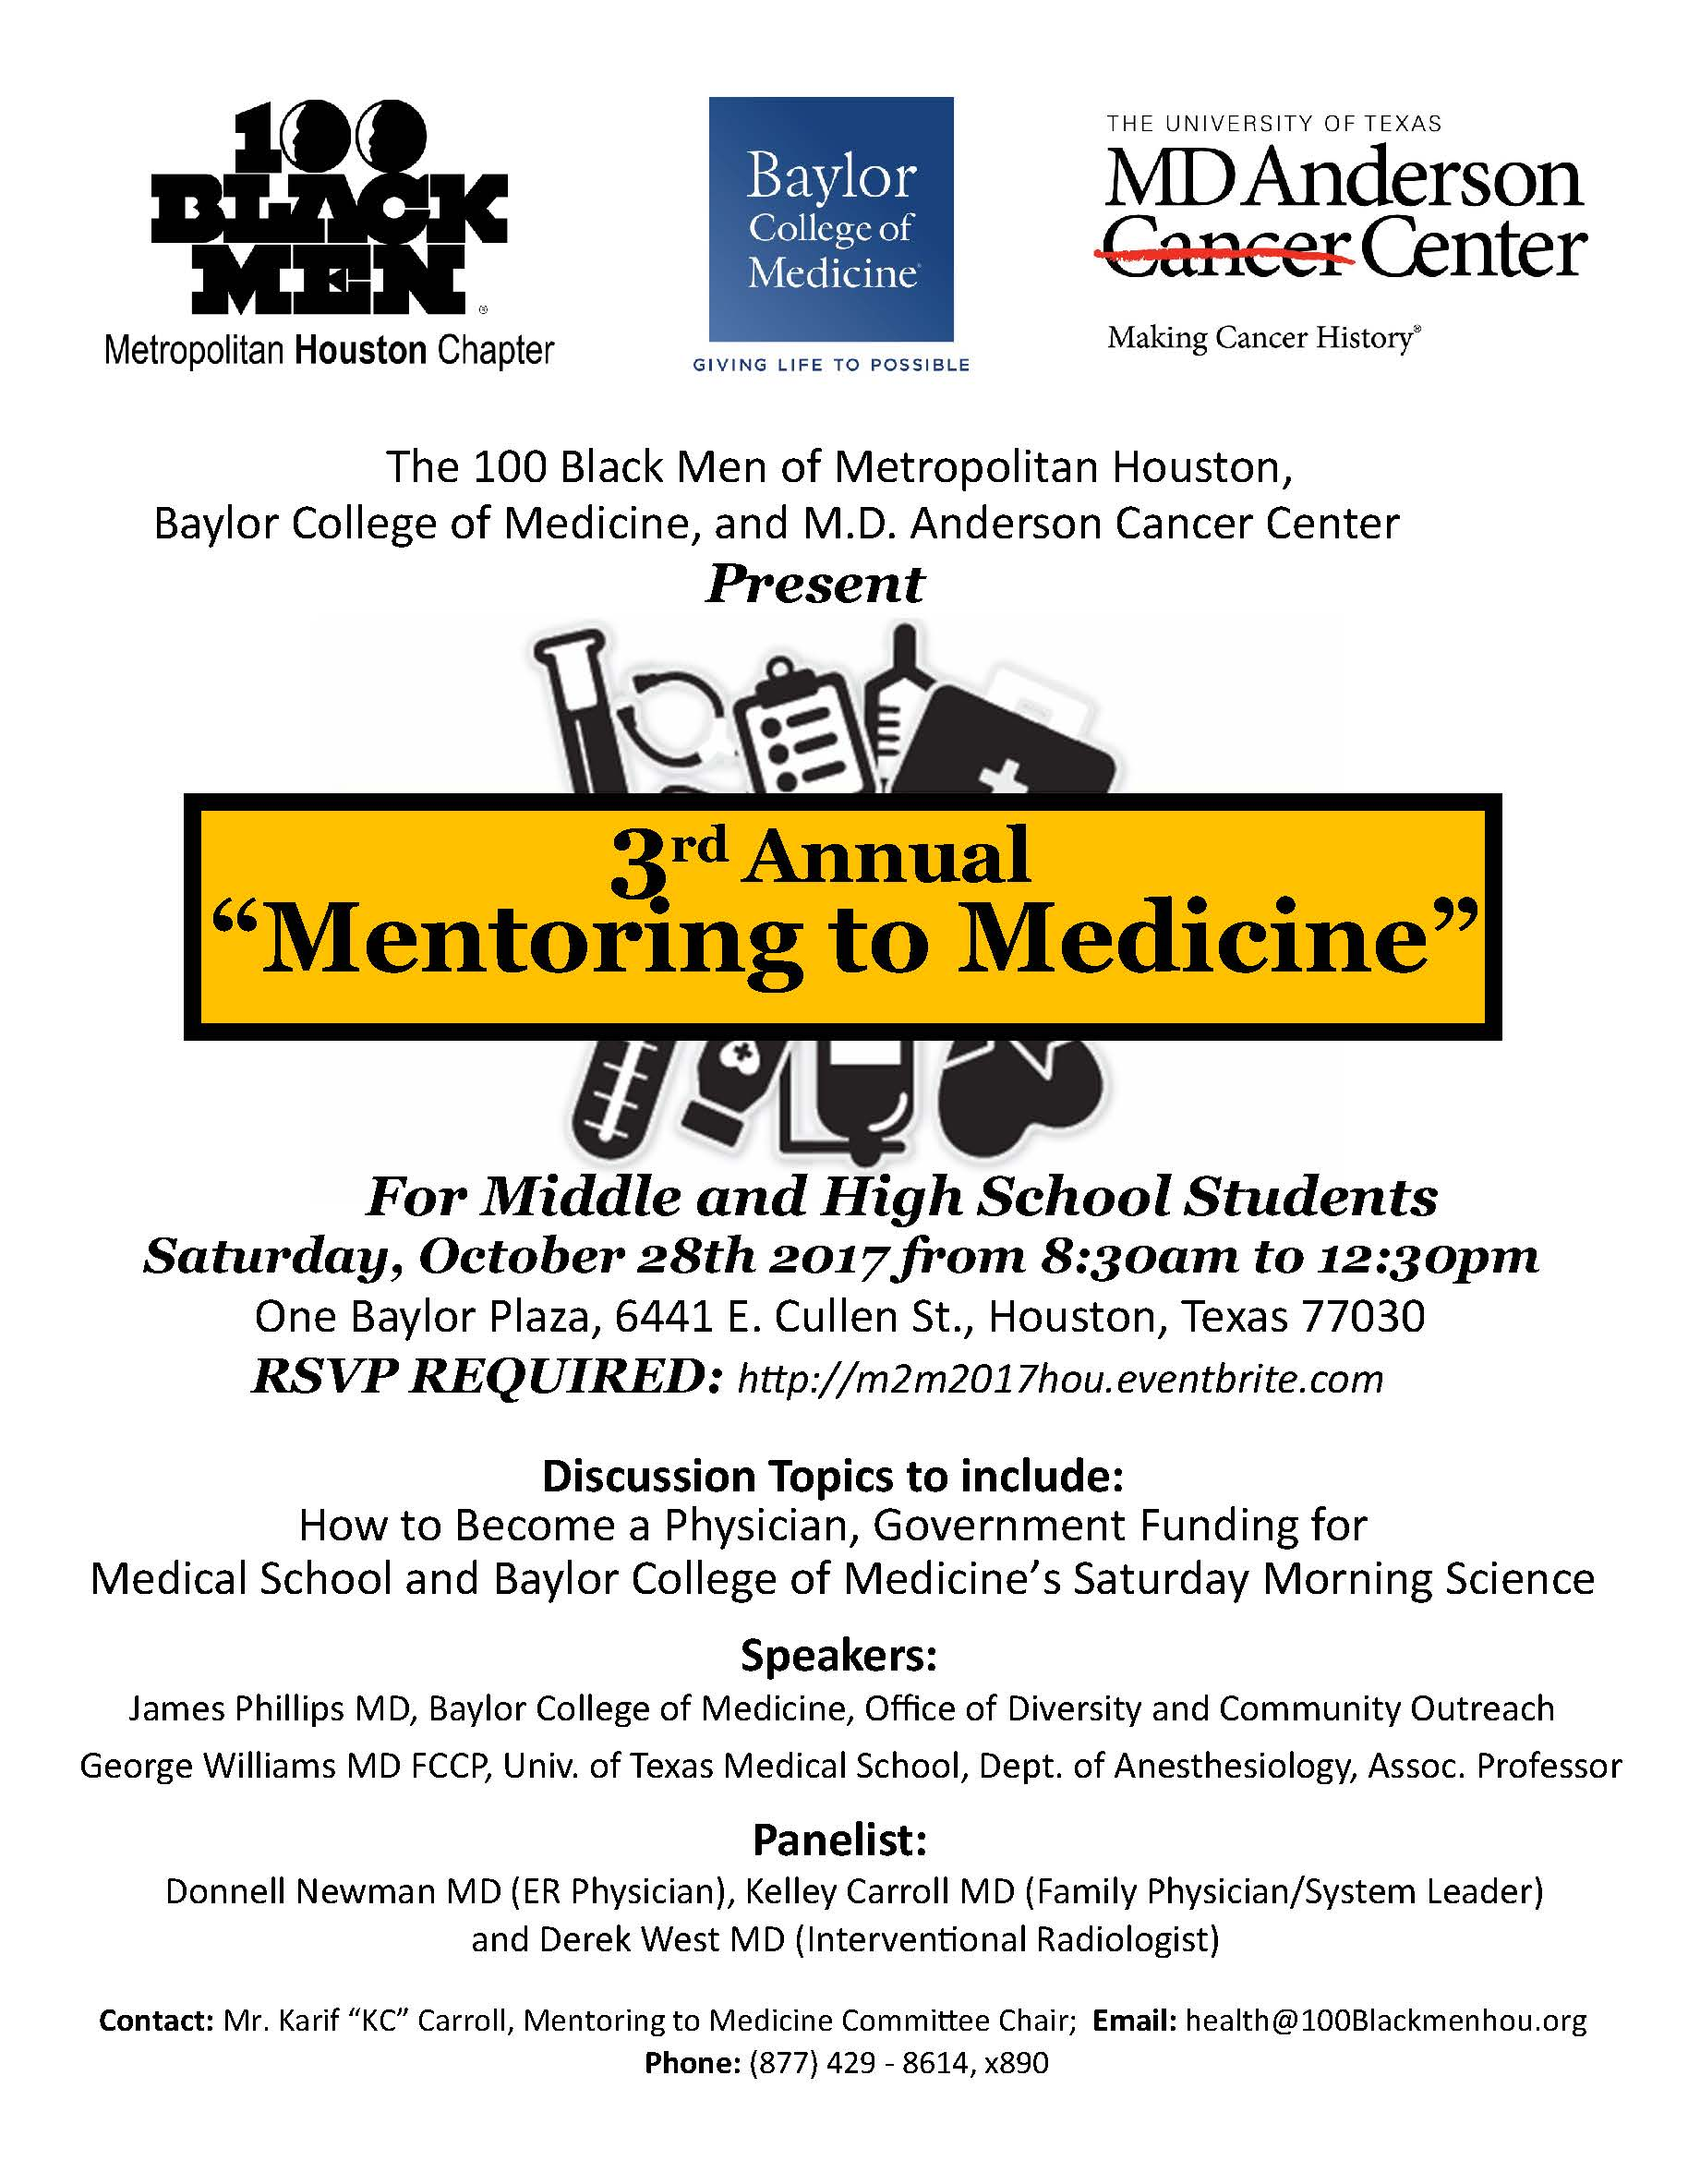 Mentoring to Medicine 2017